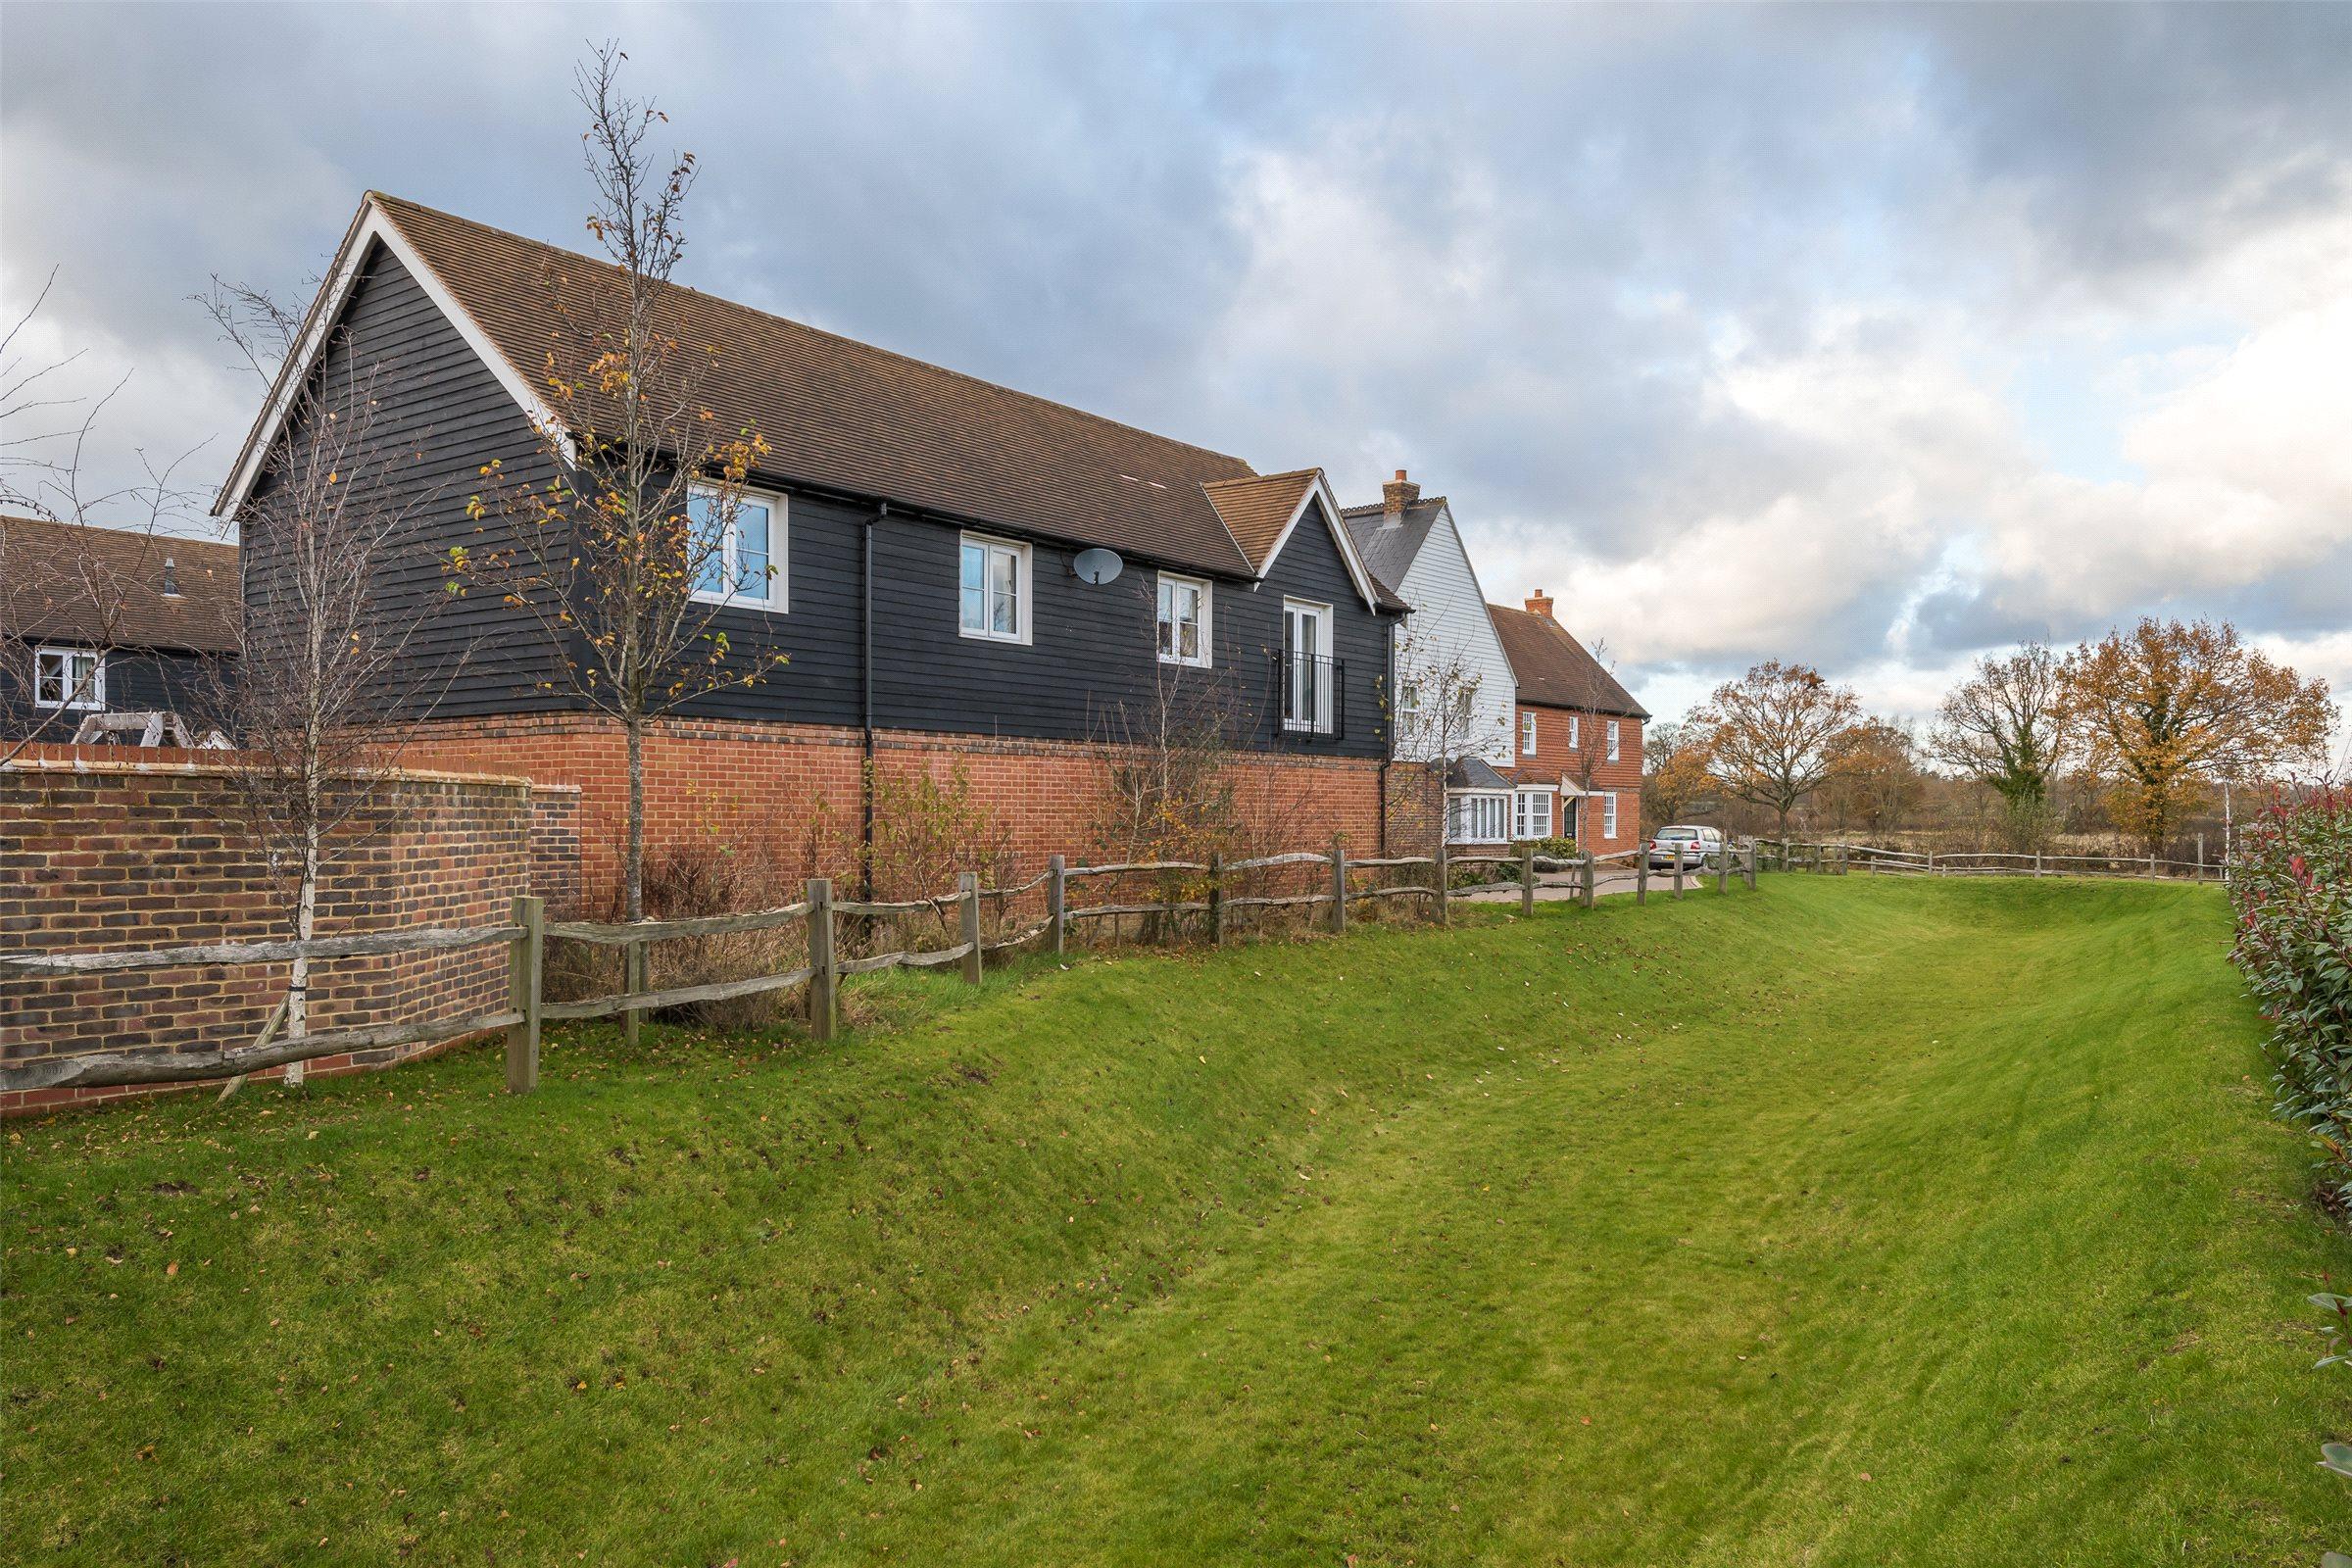 2 Bedrooms House for sale in Woodman Way, Horley, Surrey, RH6